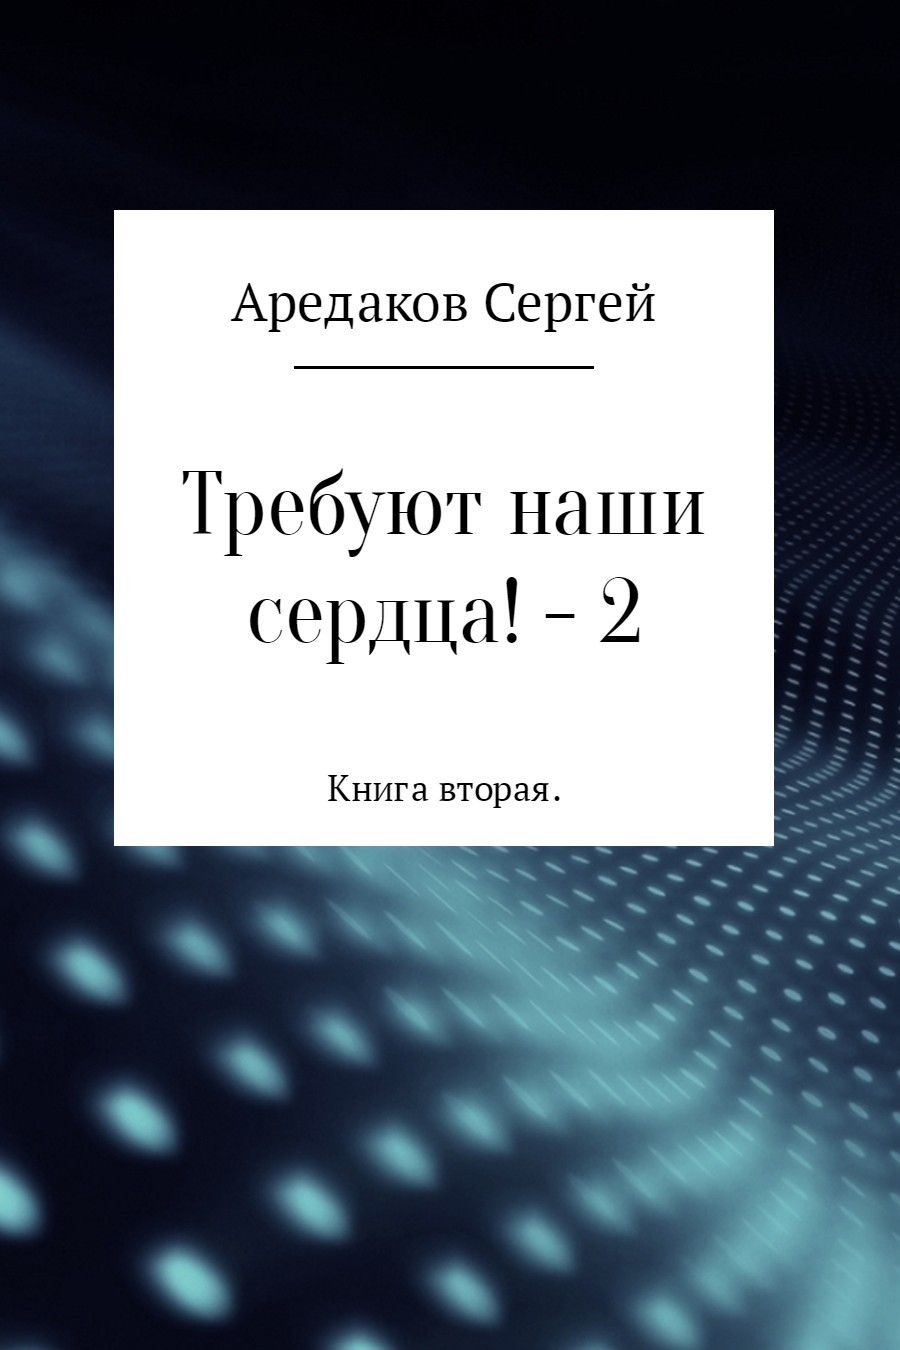 Сергей Аредаков - Требуют наши сердца!– 2